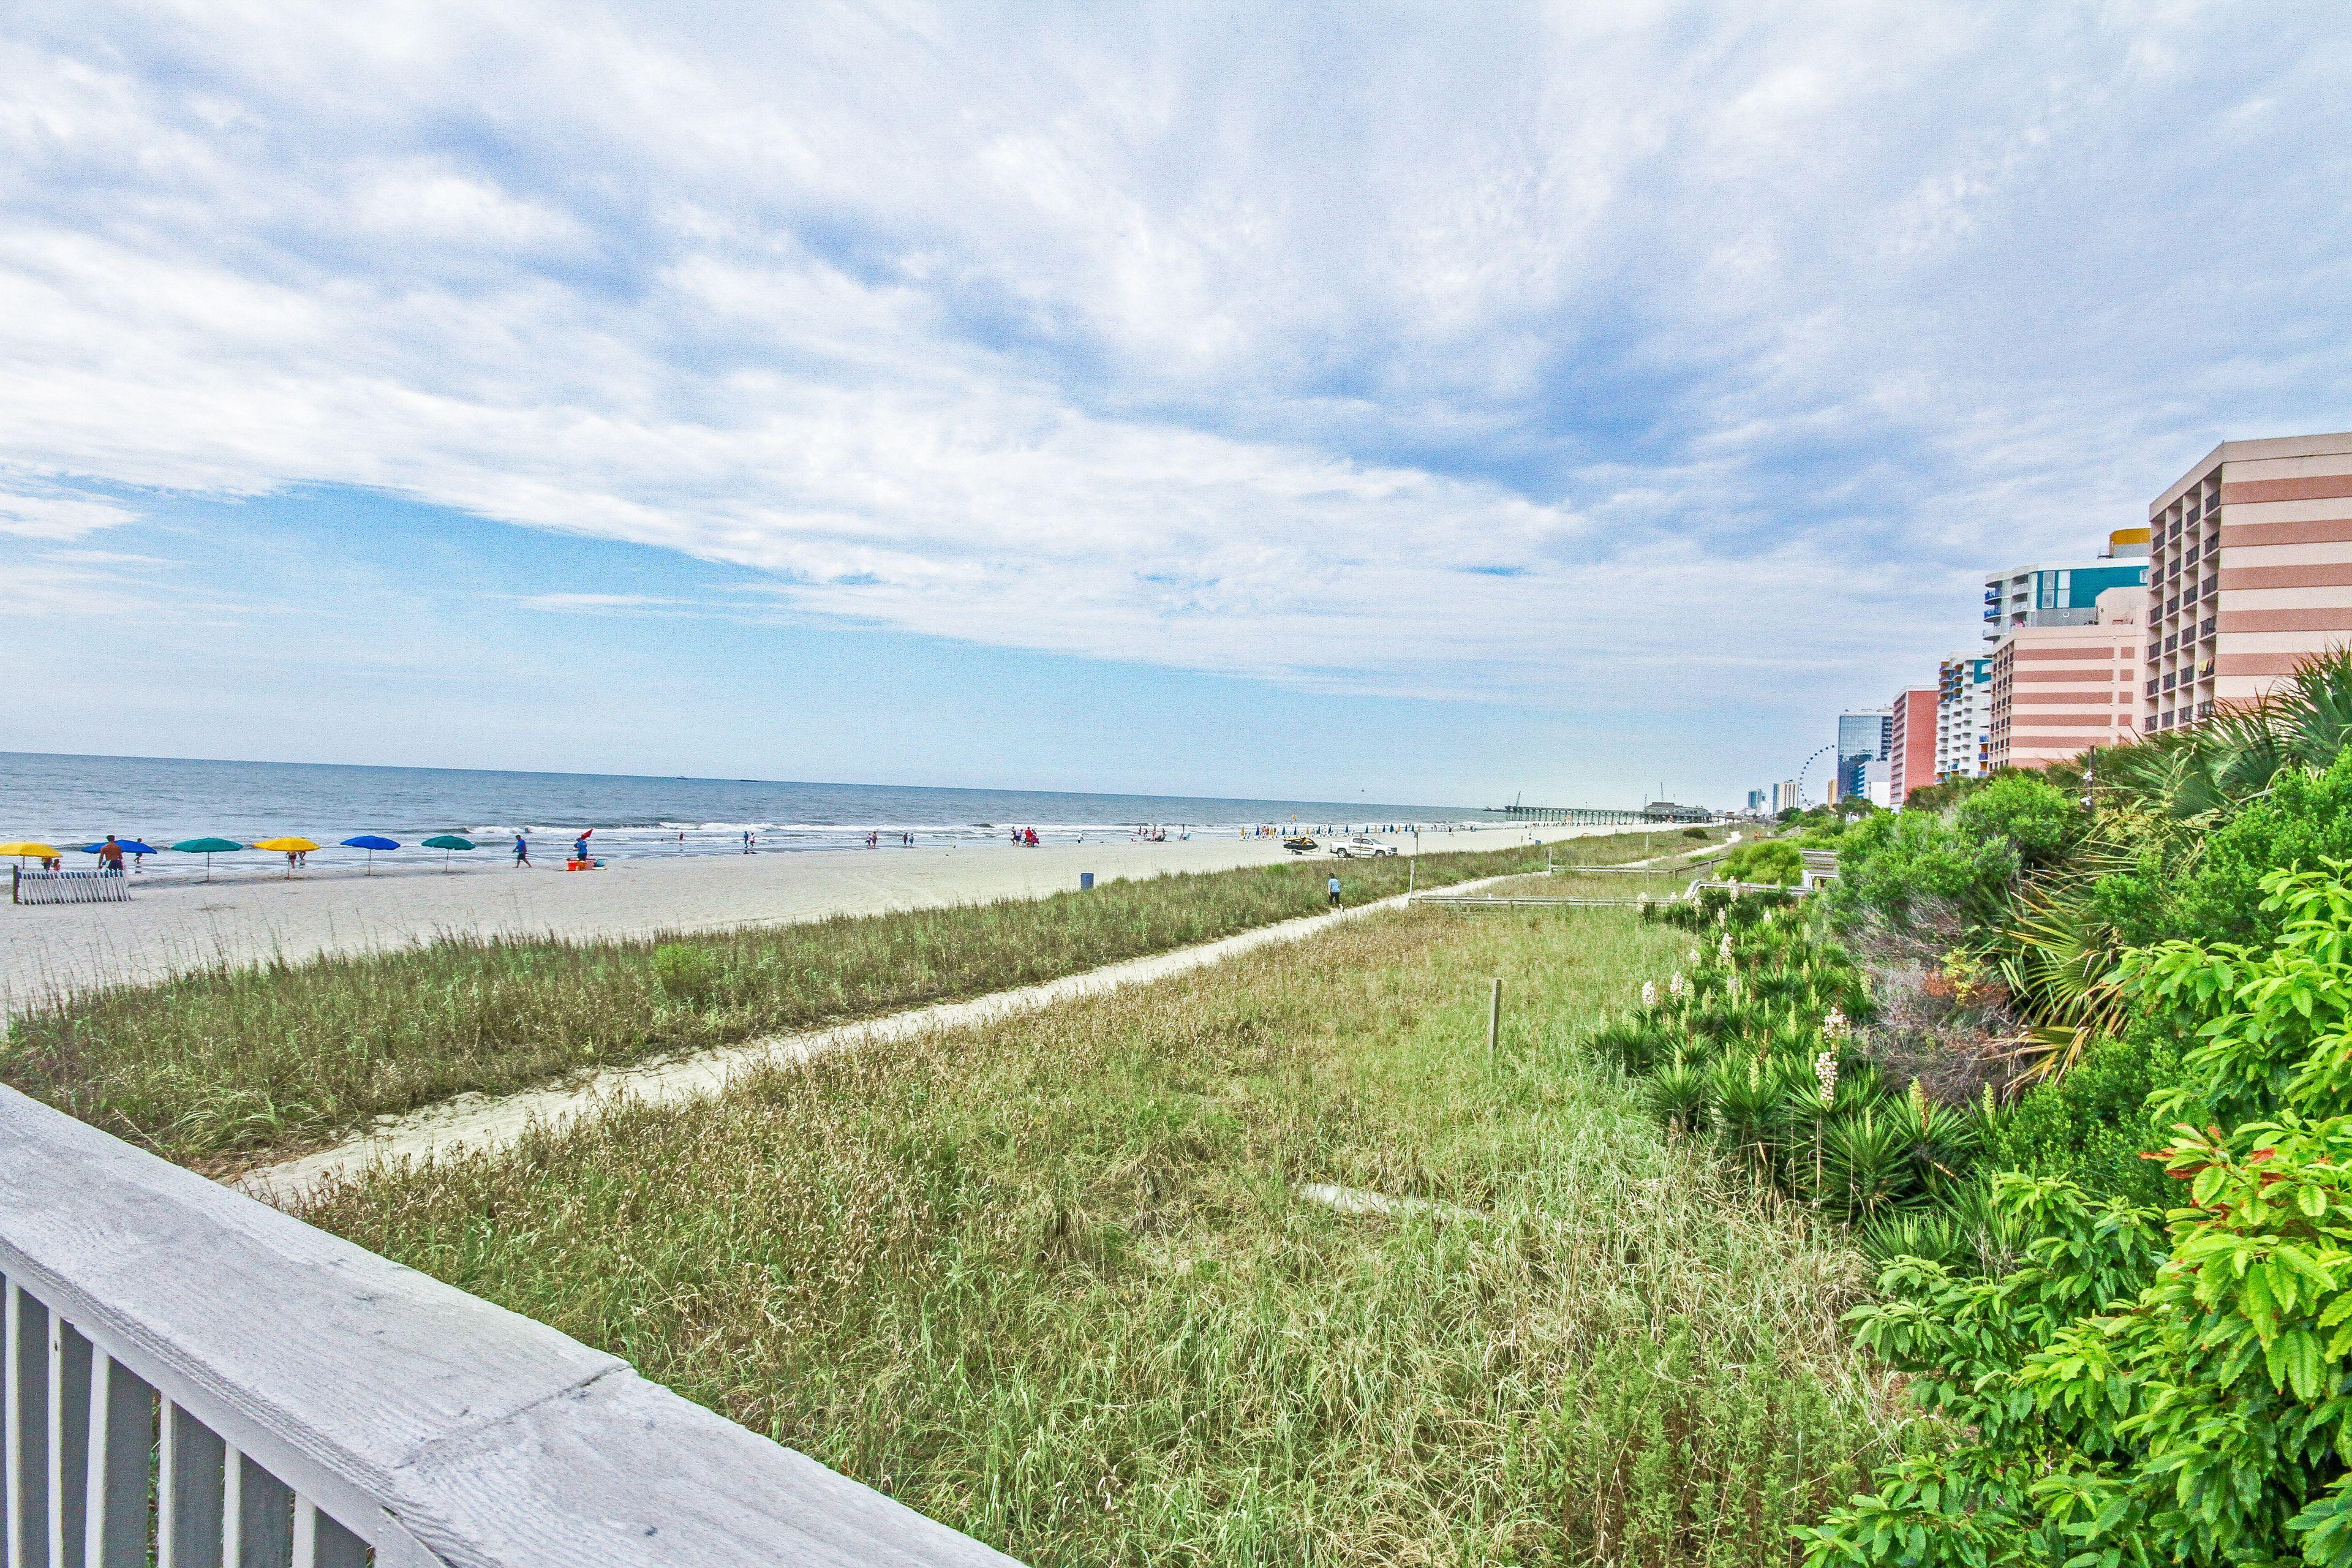 Oceana Resorts Myrtle Beach Resorts Vacation Rentals